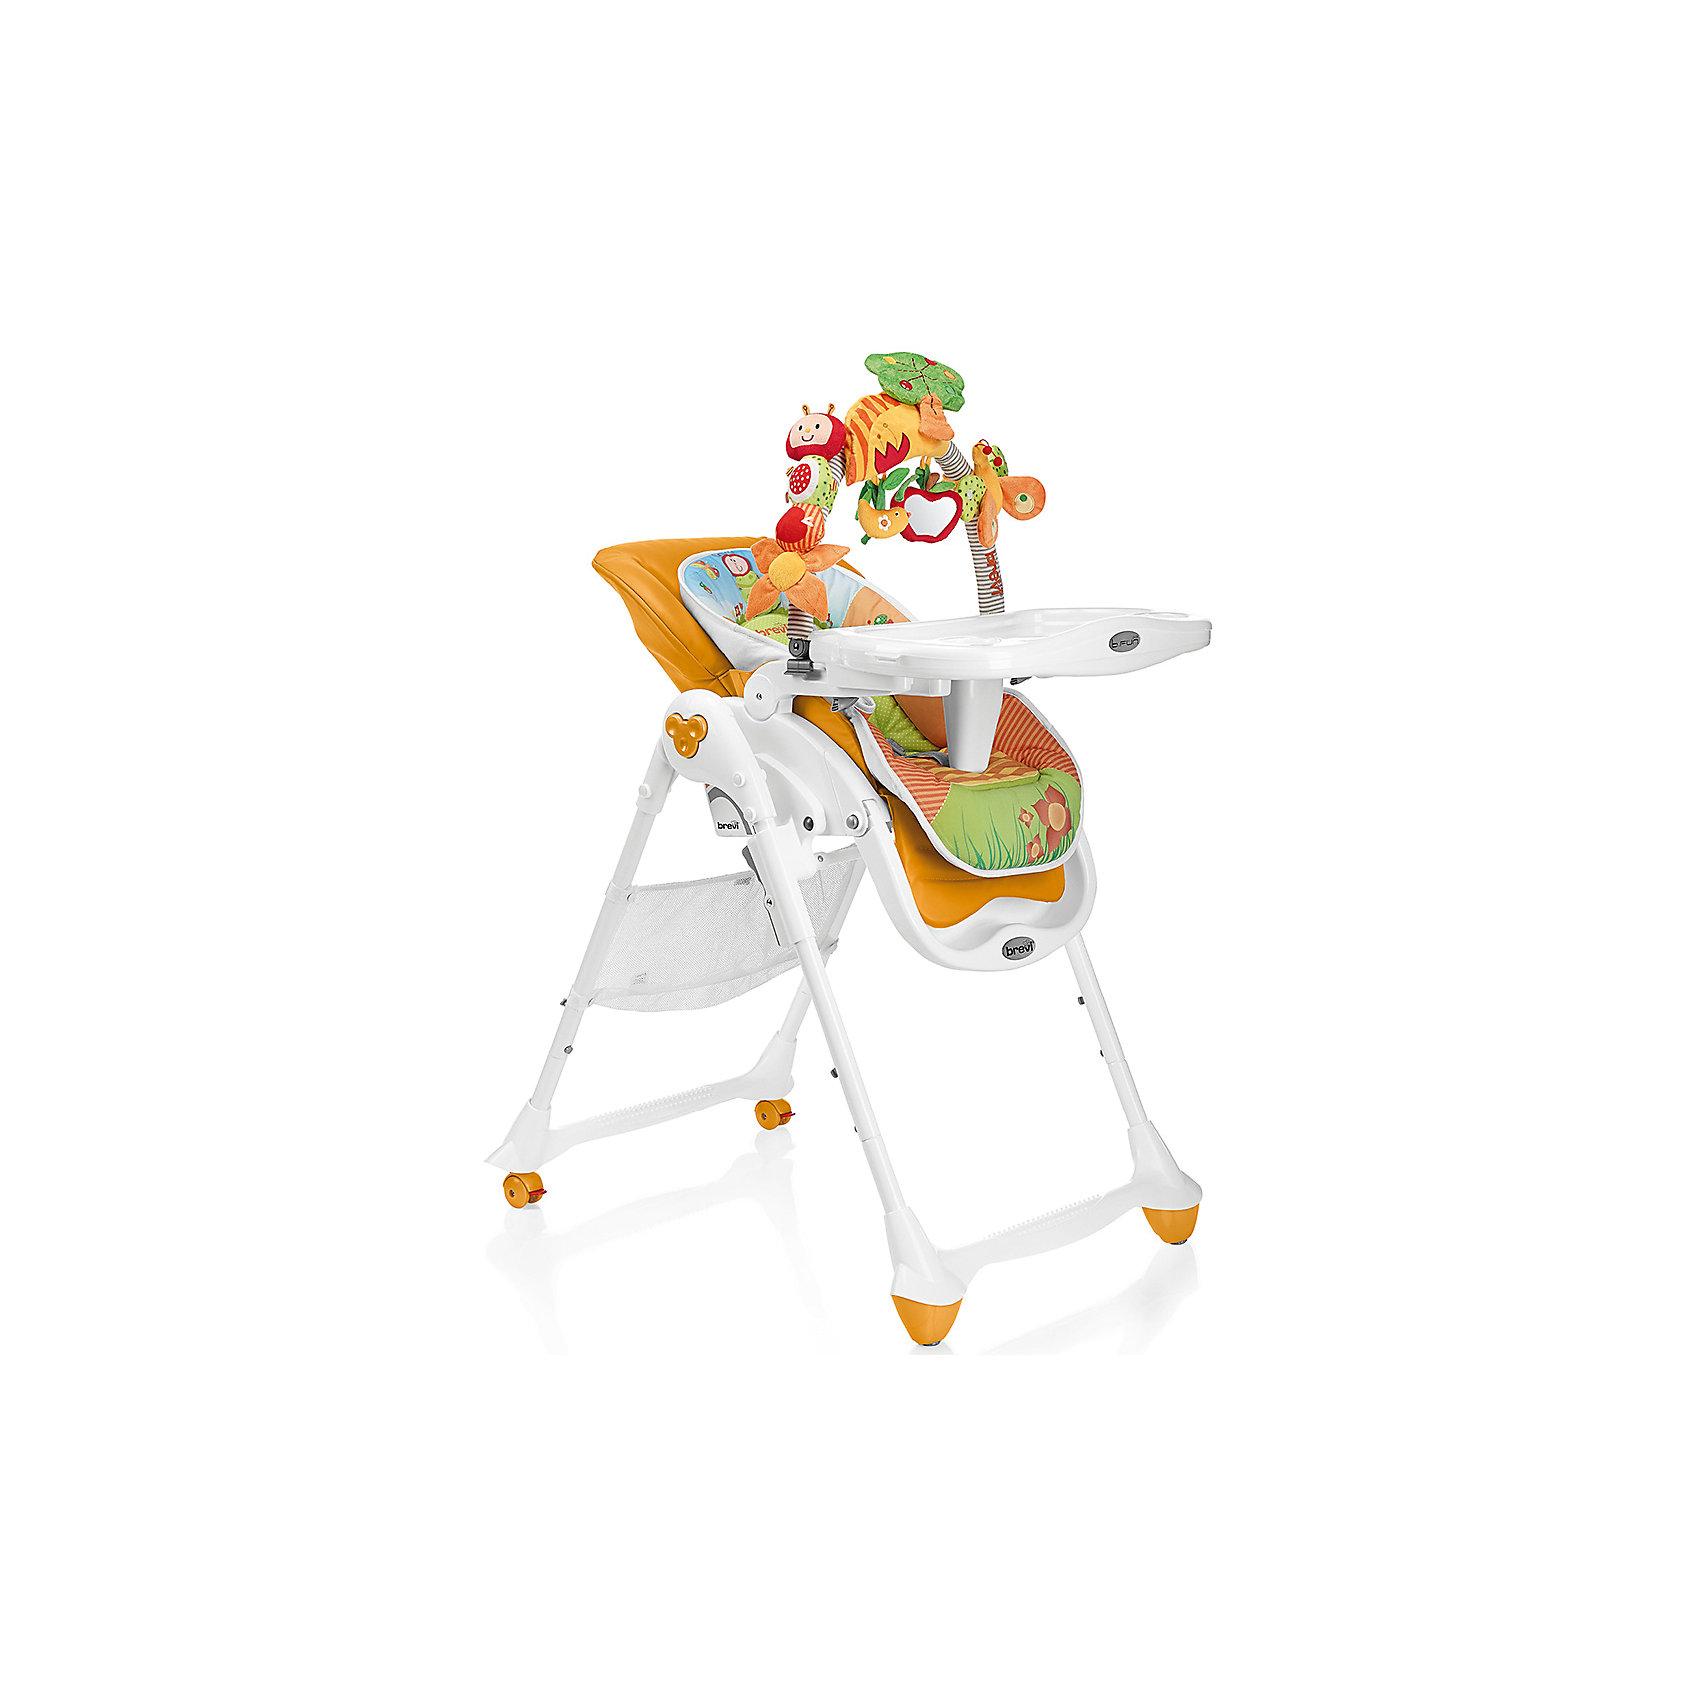 brevi Стульчик для кормления B-Fun, Brevi, оранжевый brevi детская прогулочная коляска brevi b light